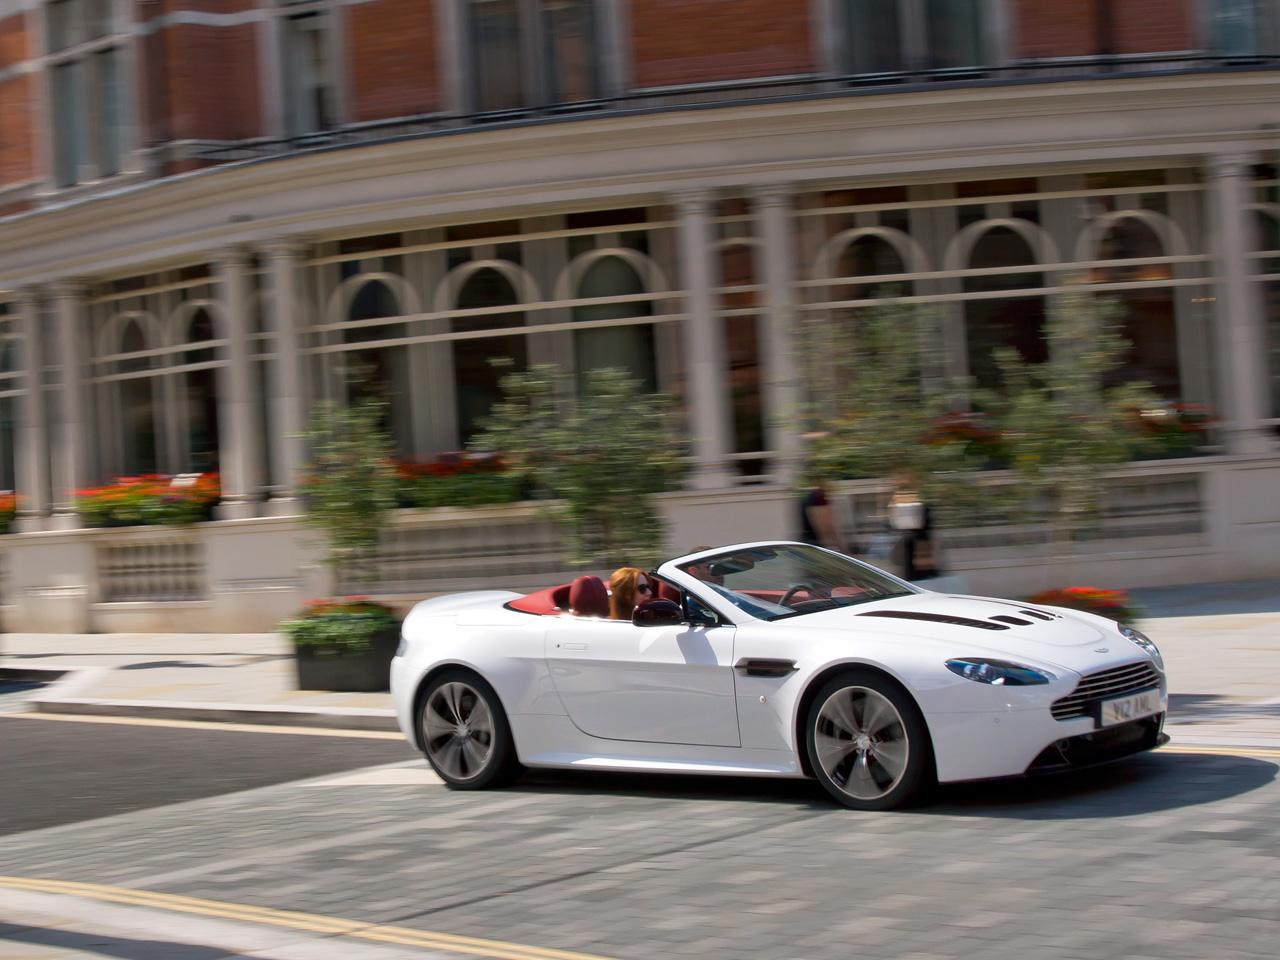 http://1.bp.blogspot.com/-TPOj4D5DfYY/UFmUMgPauOI/AAAAAAAAAQs/GC_qIjMM3i4/s1600/2012-Aston-Martin-V12-Vantage-Roadster-2.jpg